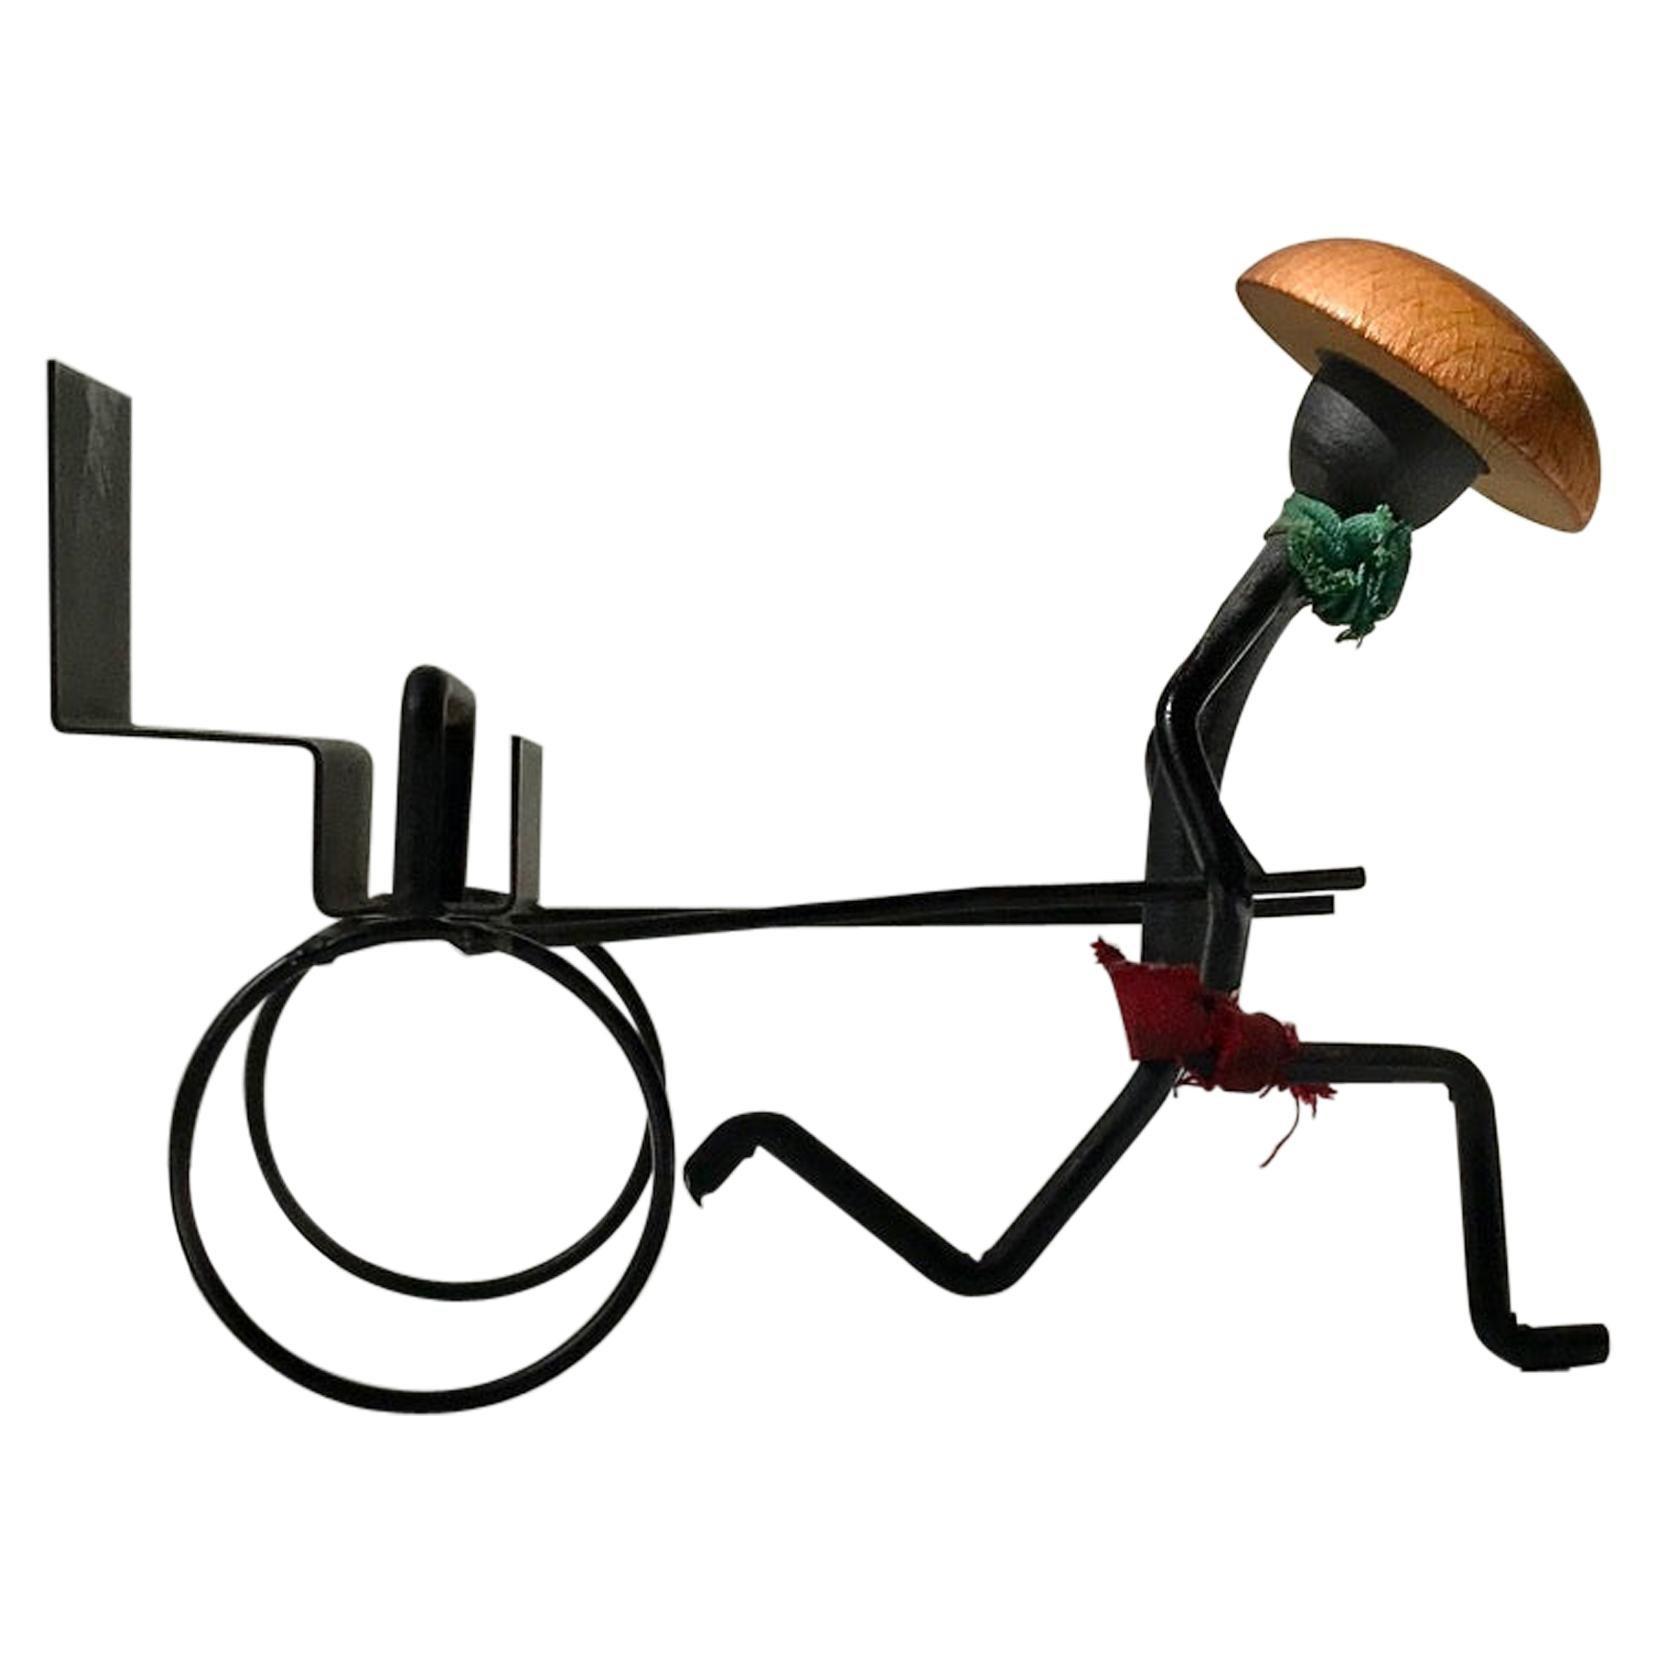 Midcentury Black String Iron Rigshaw by Bror Bonfils, 1950s